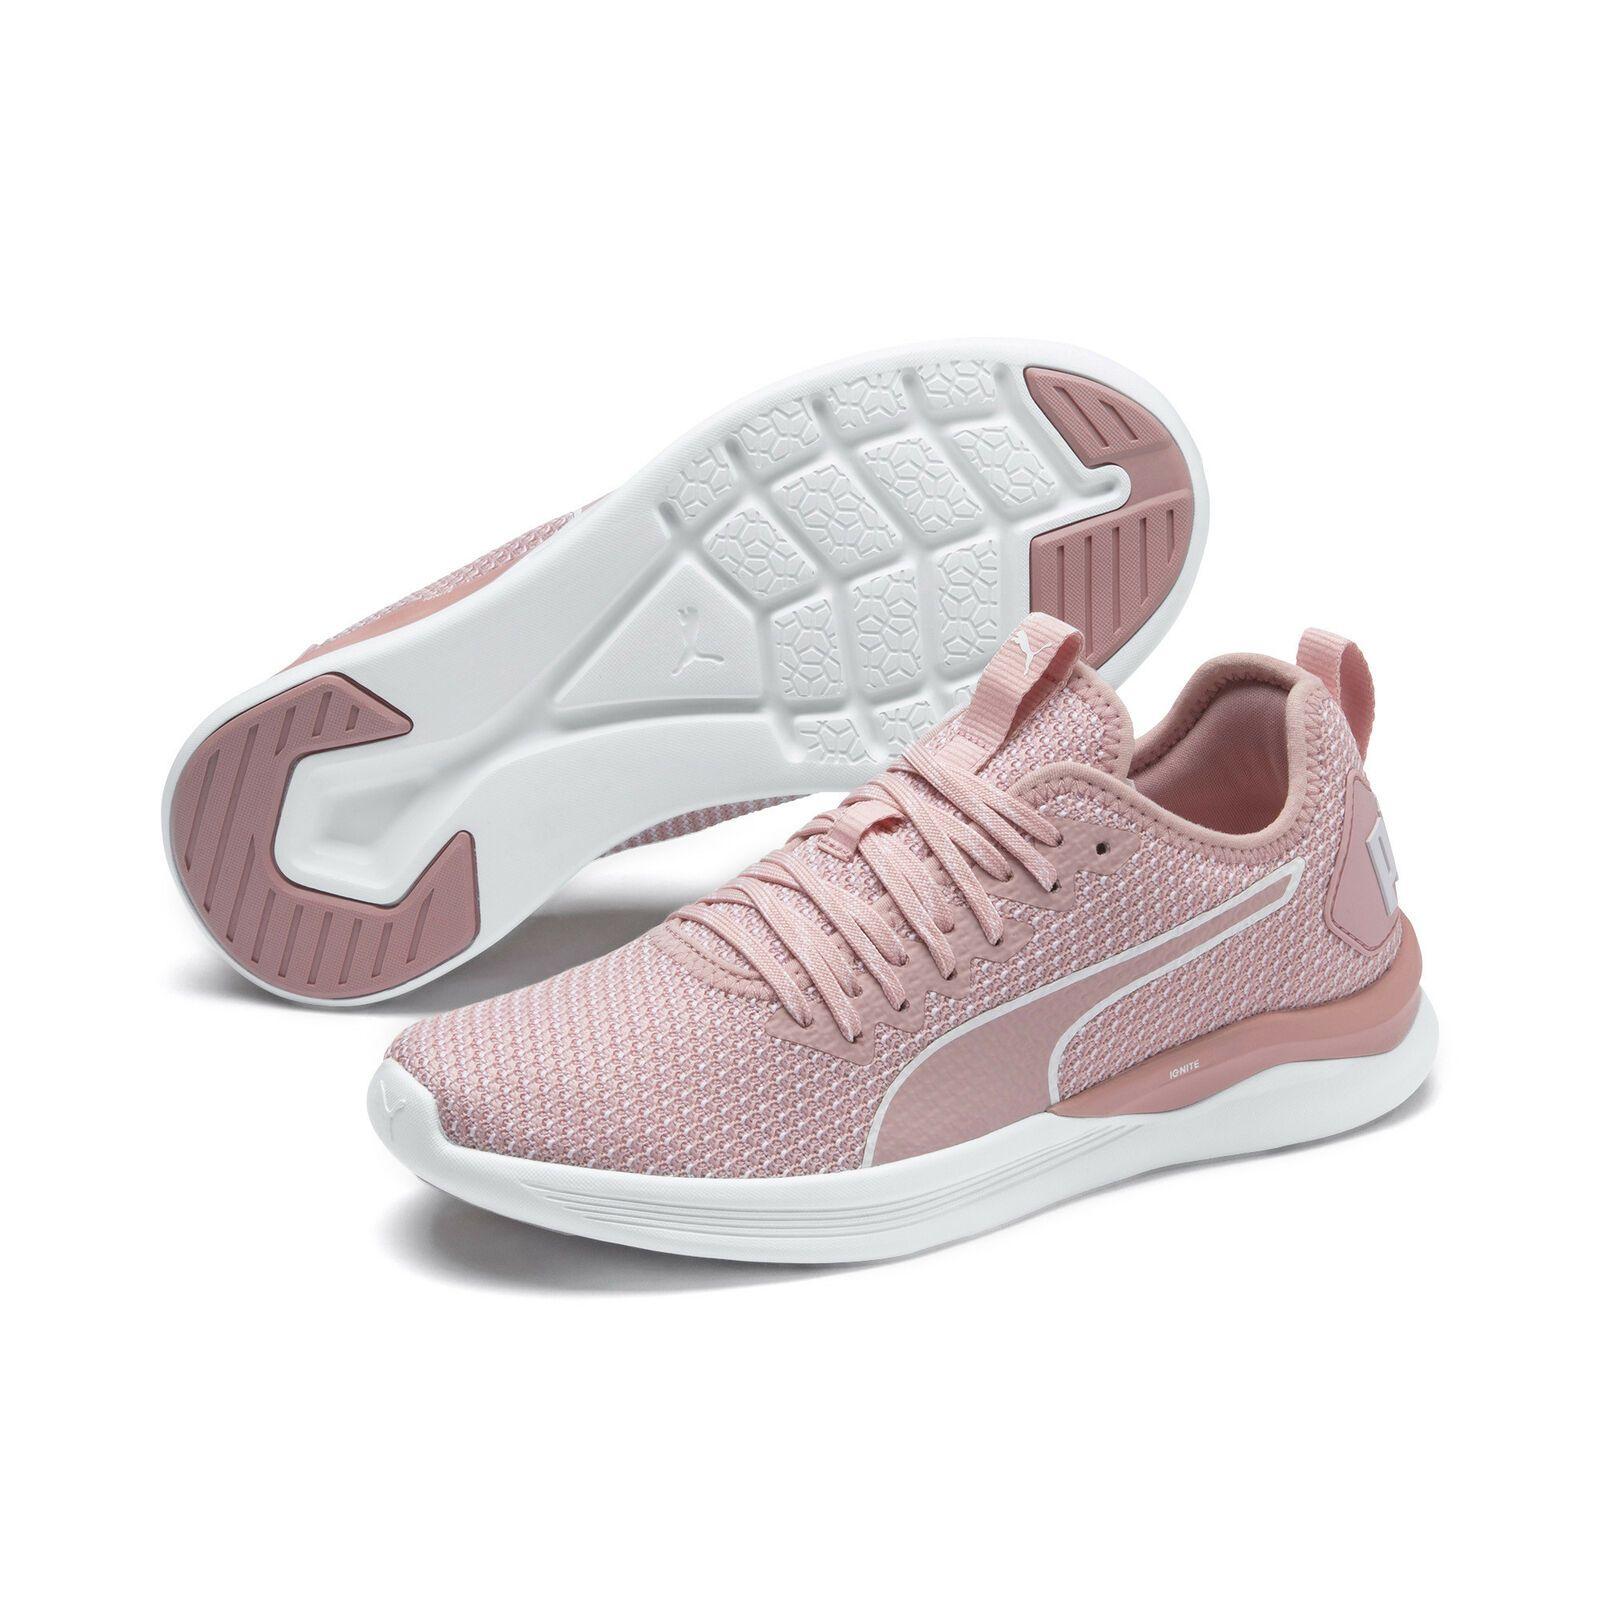 47+ Puma slip on shoes ideas ideas